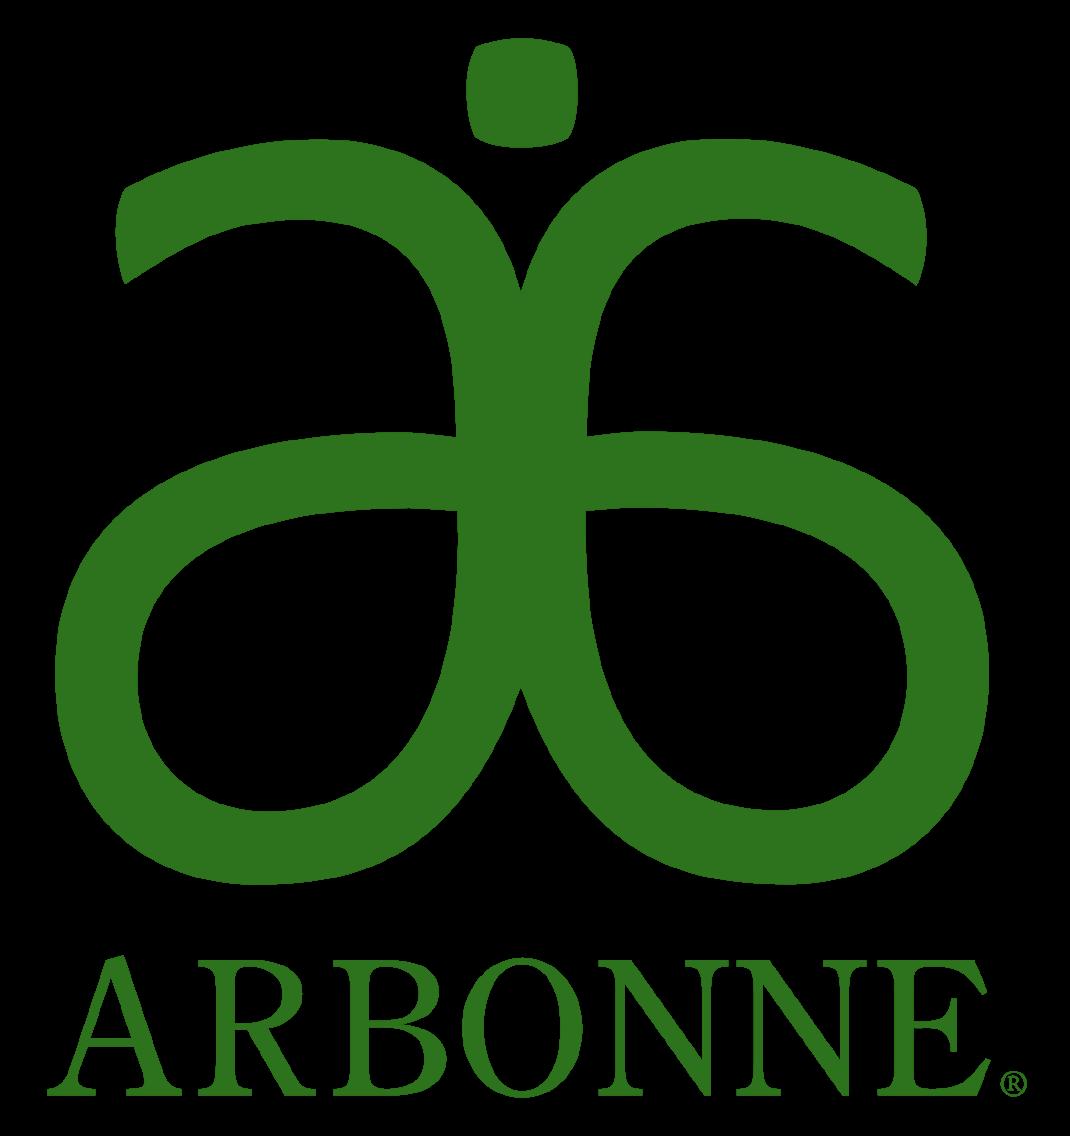 arbonne-logo-transparent.png